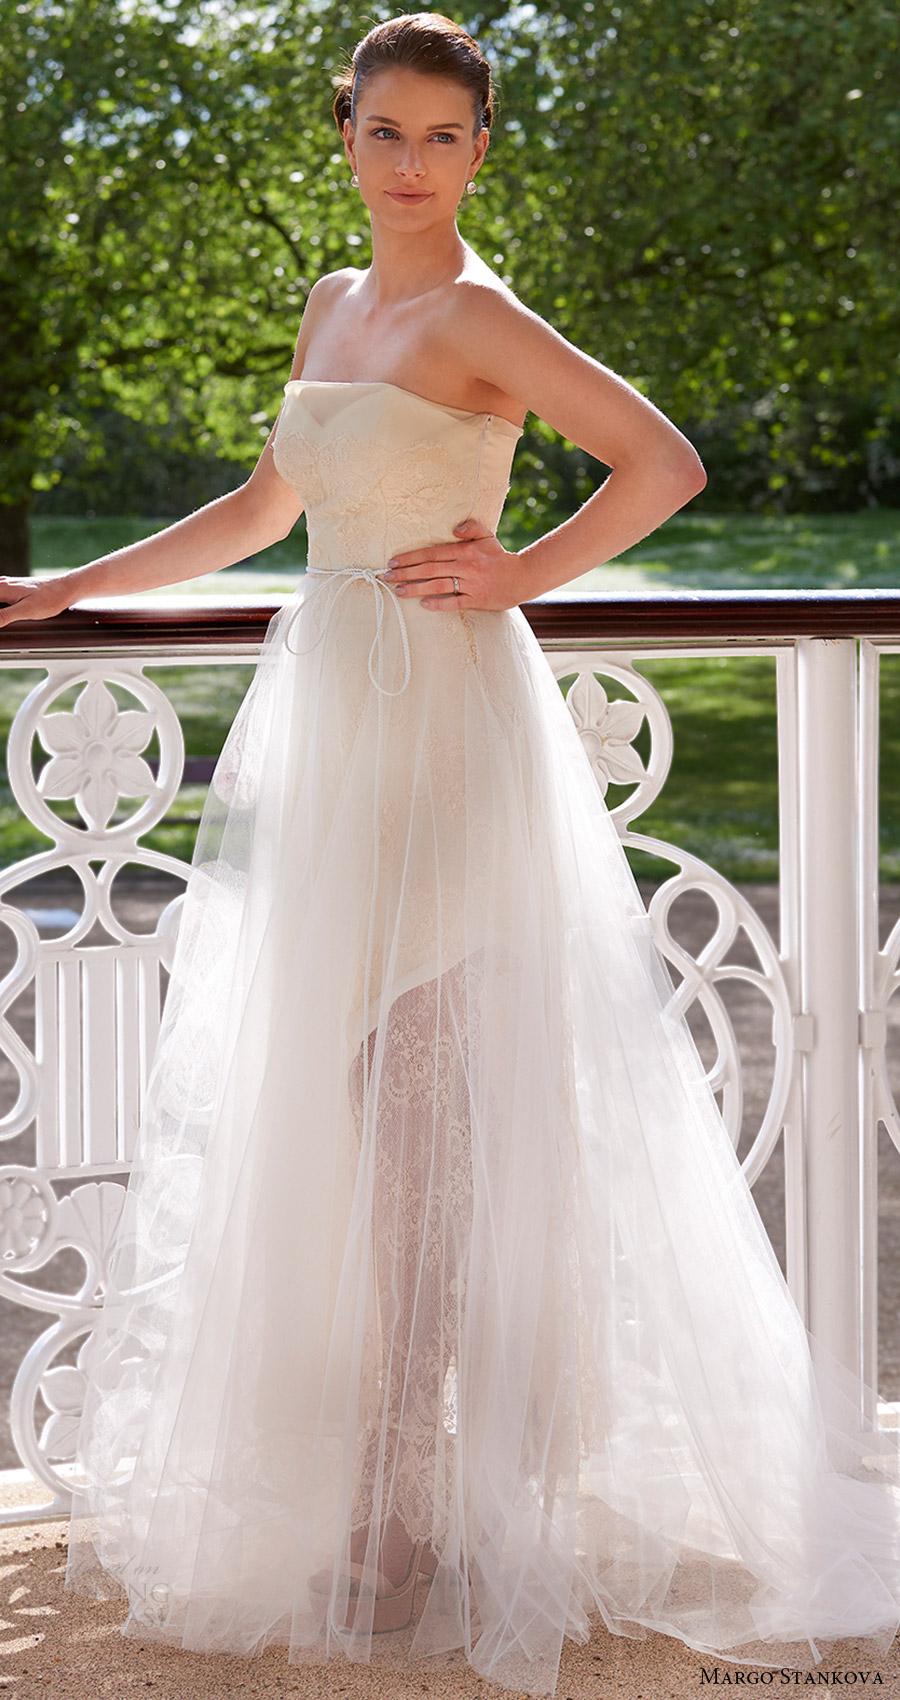 margo stankova bridal 2017 strapless illusion sweetheart ball gown wedding dress (04) mv